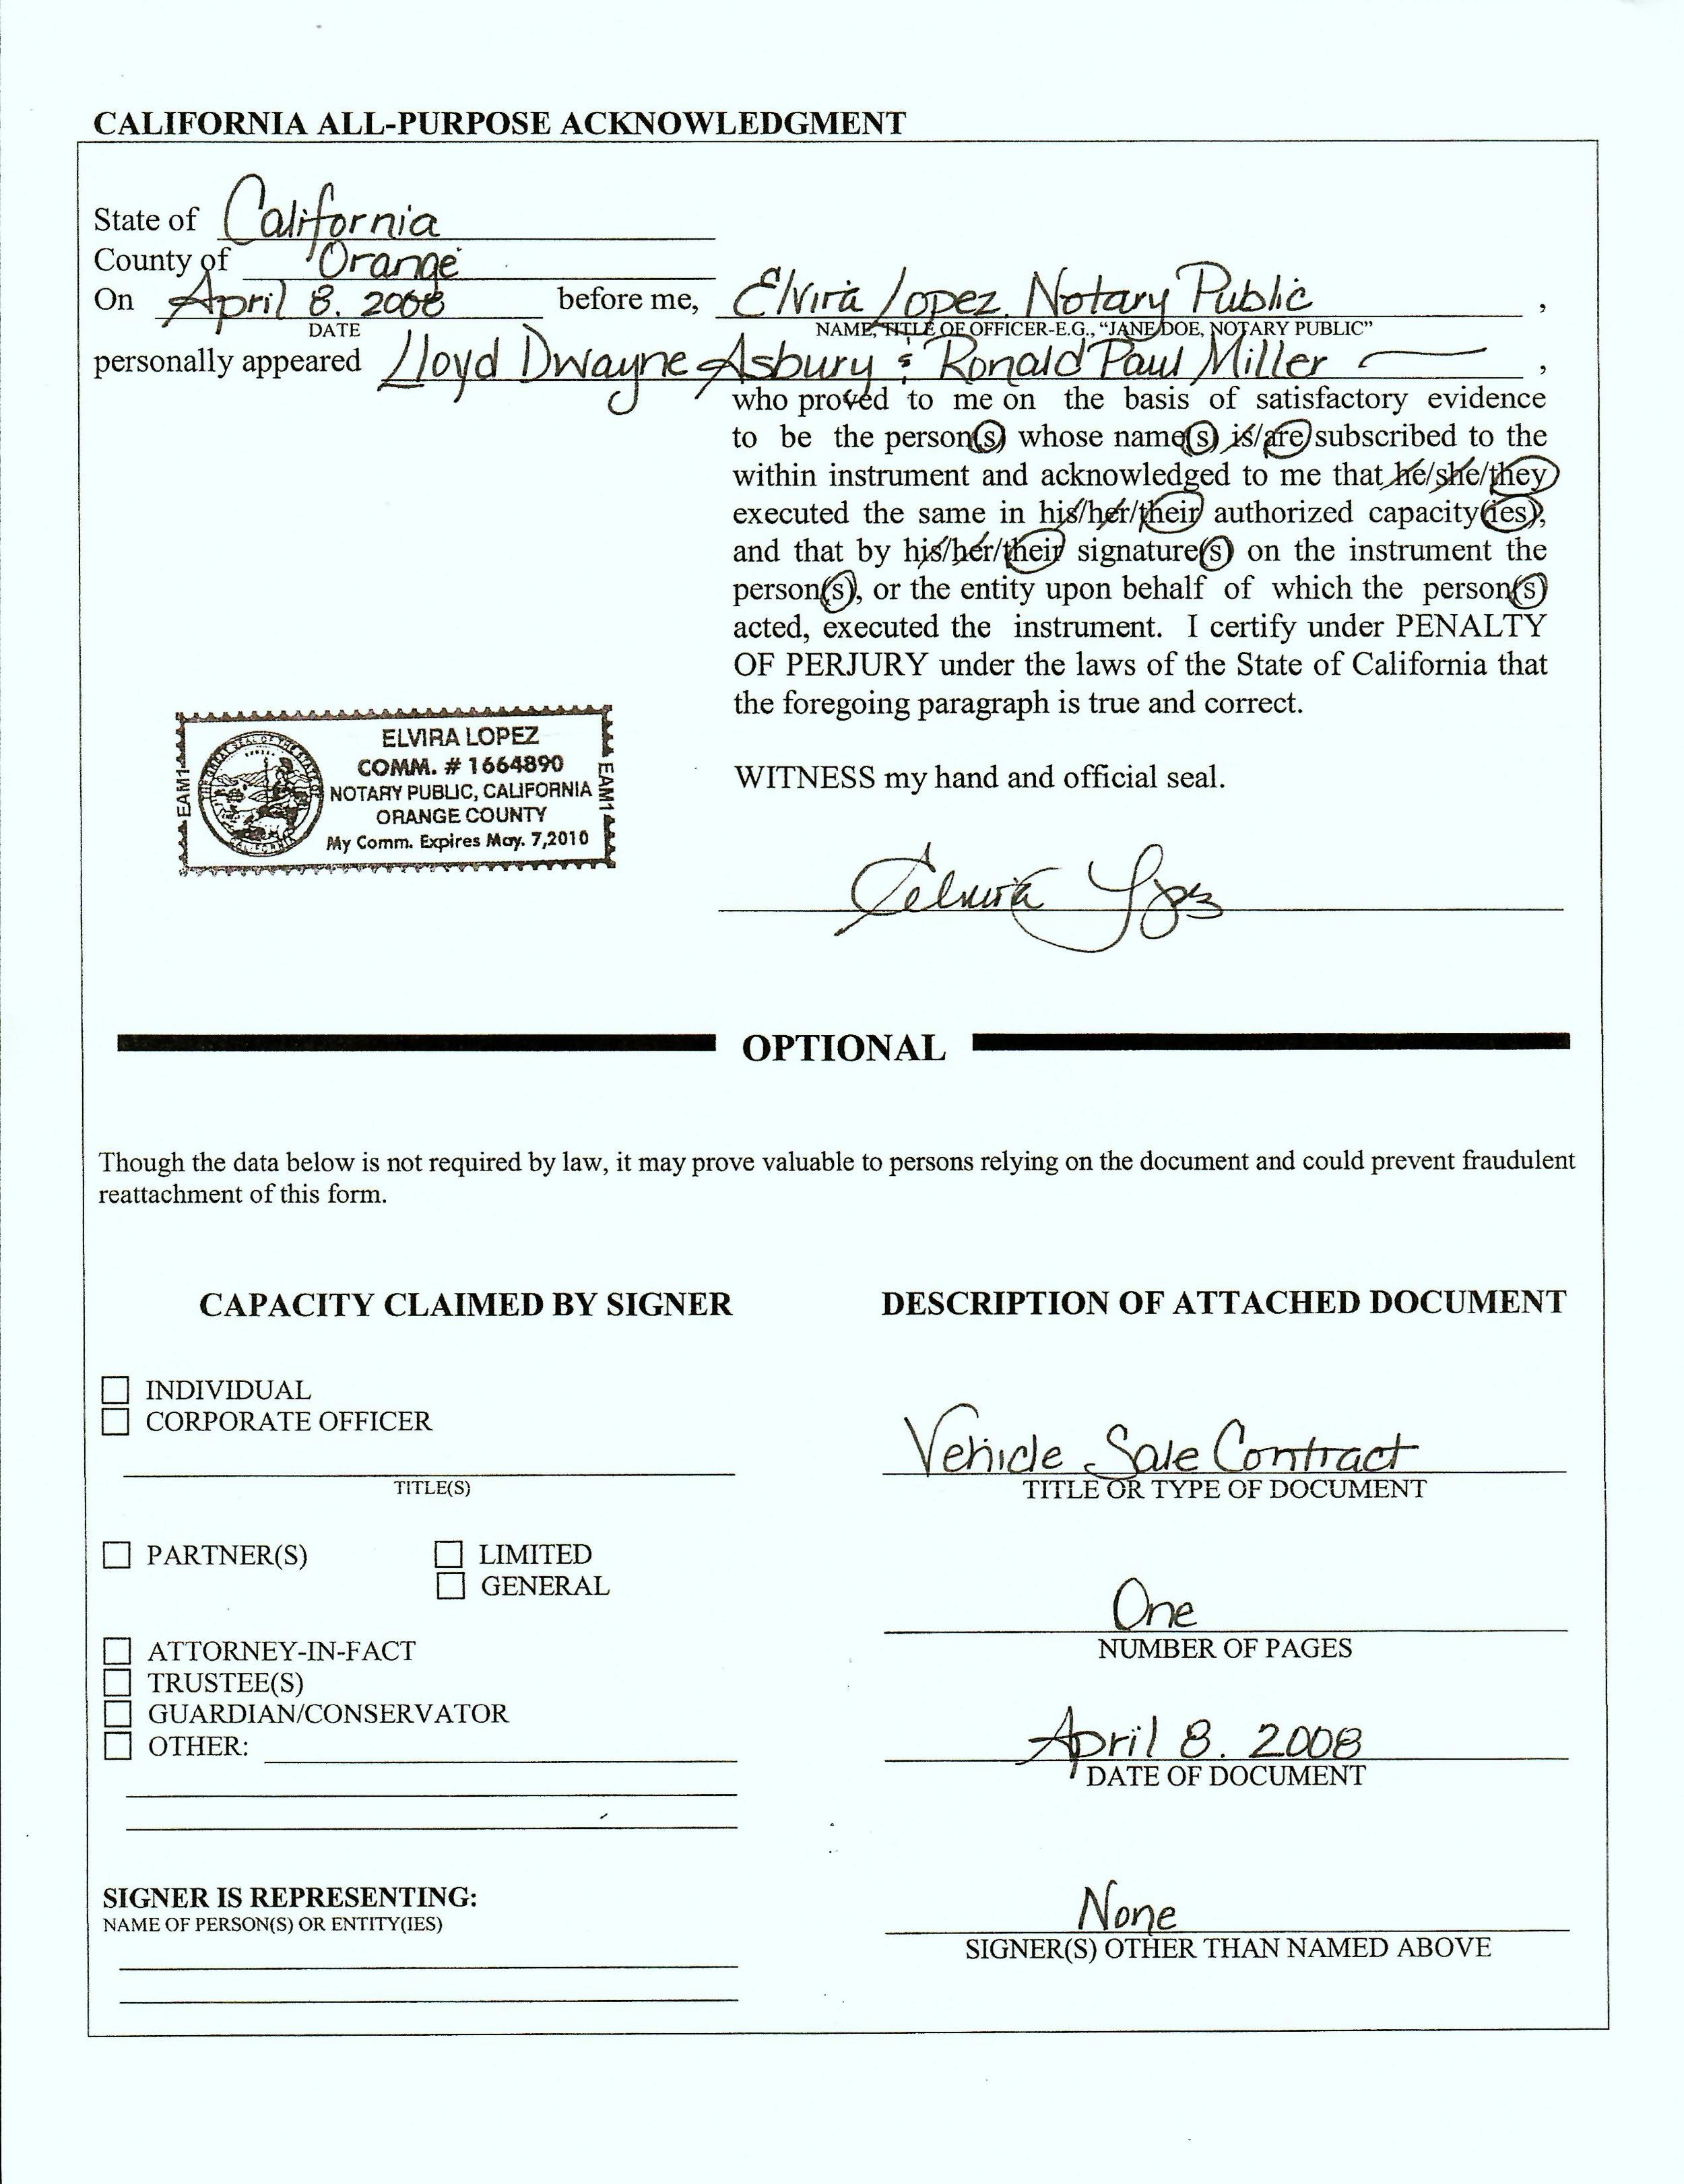 2008 Sale Contract Notarization.jpeg